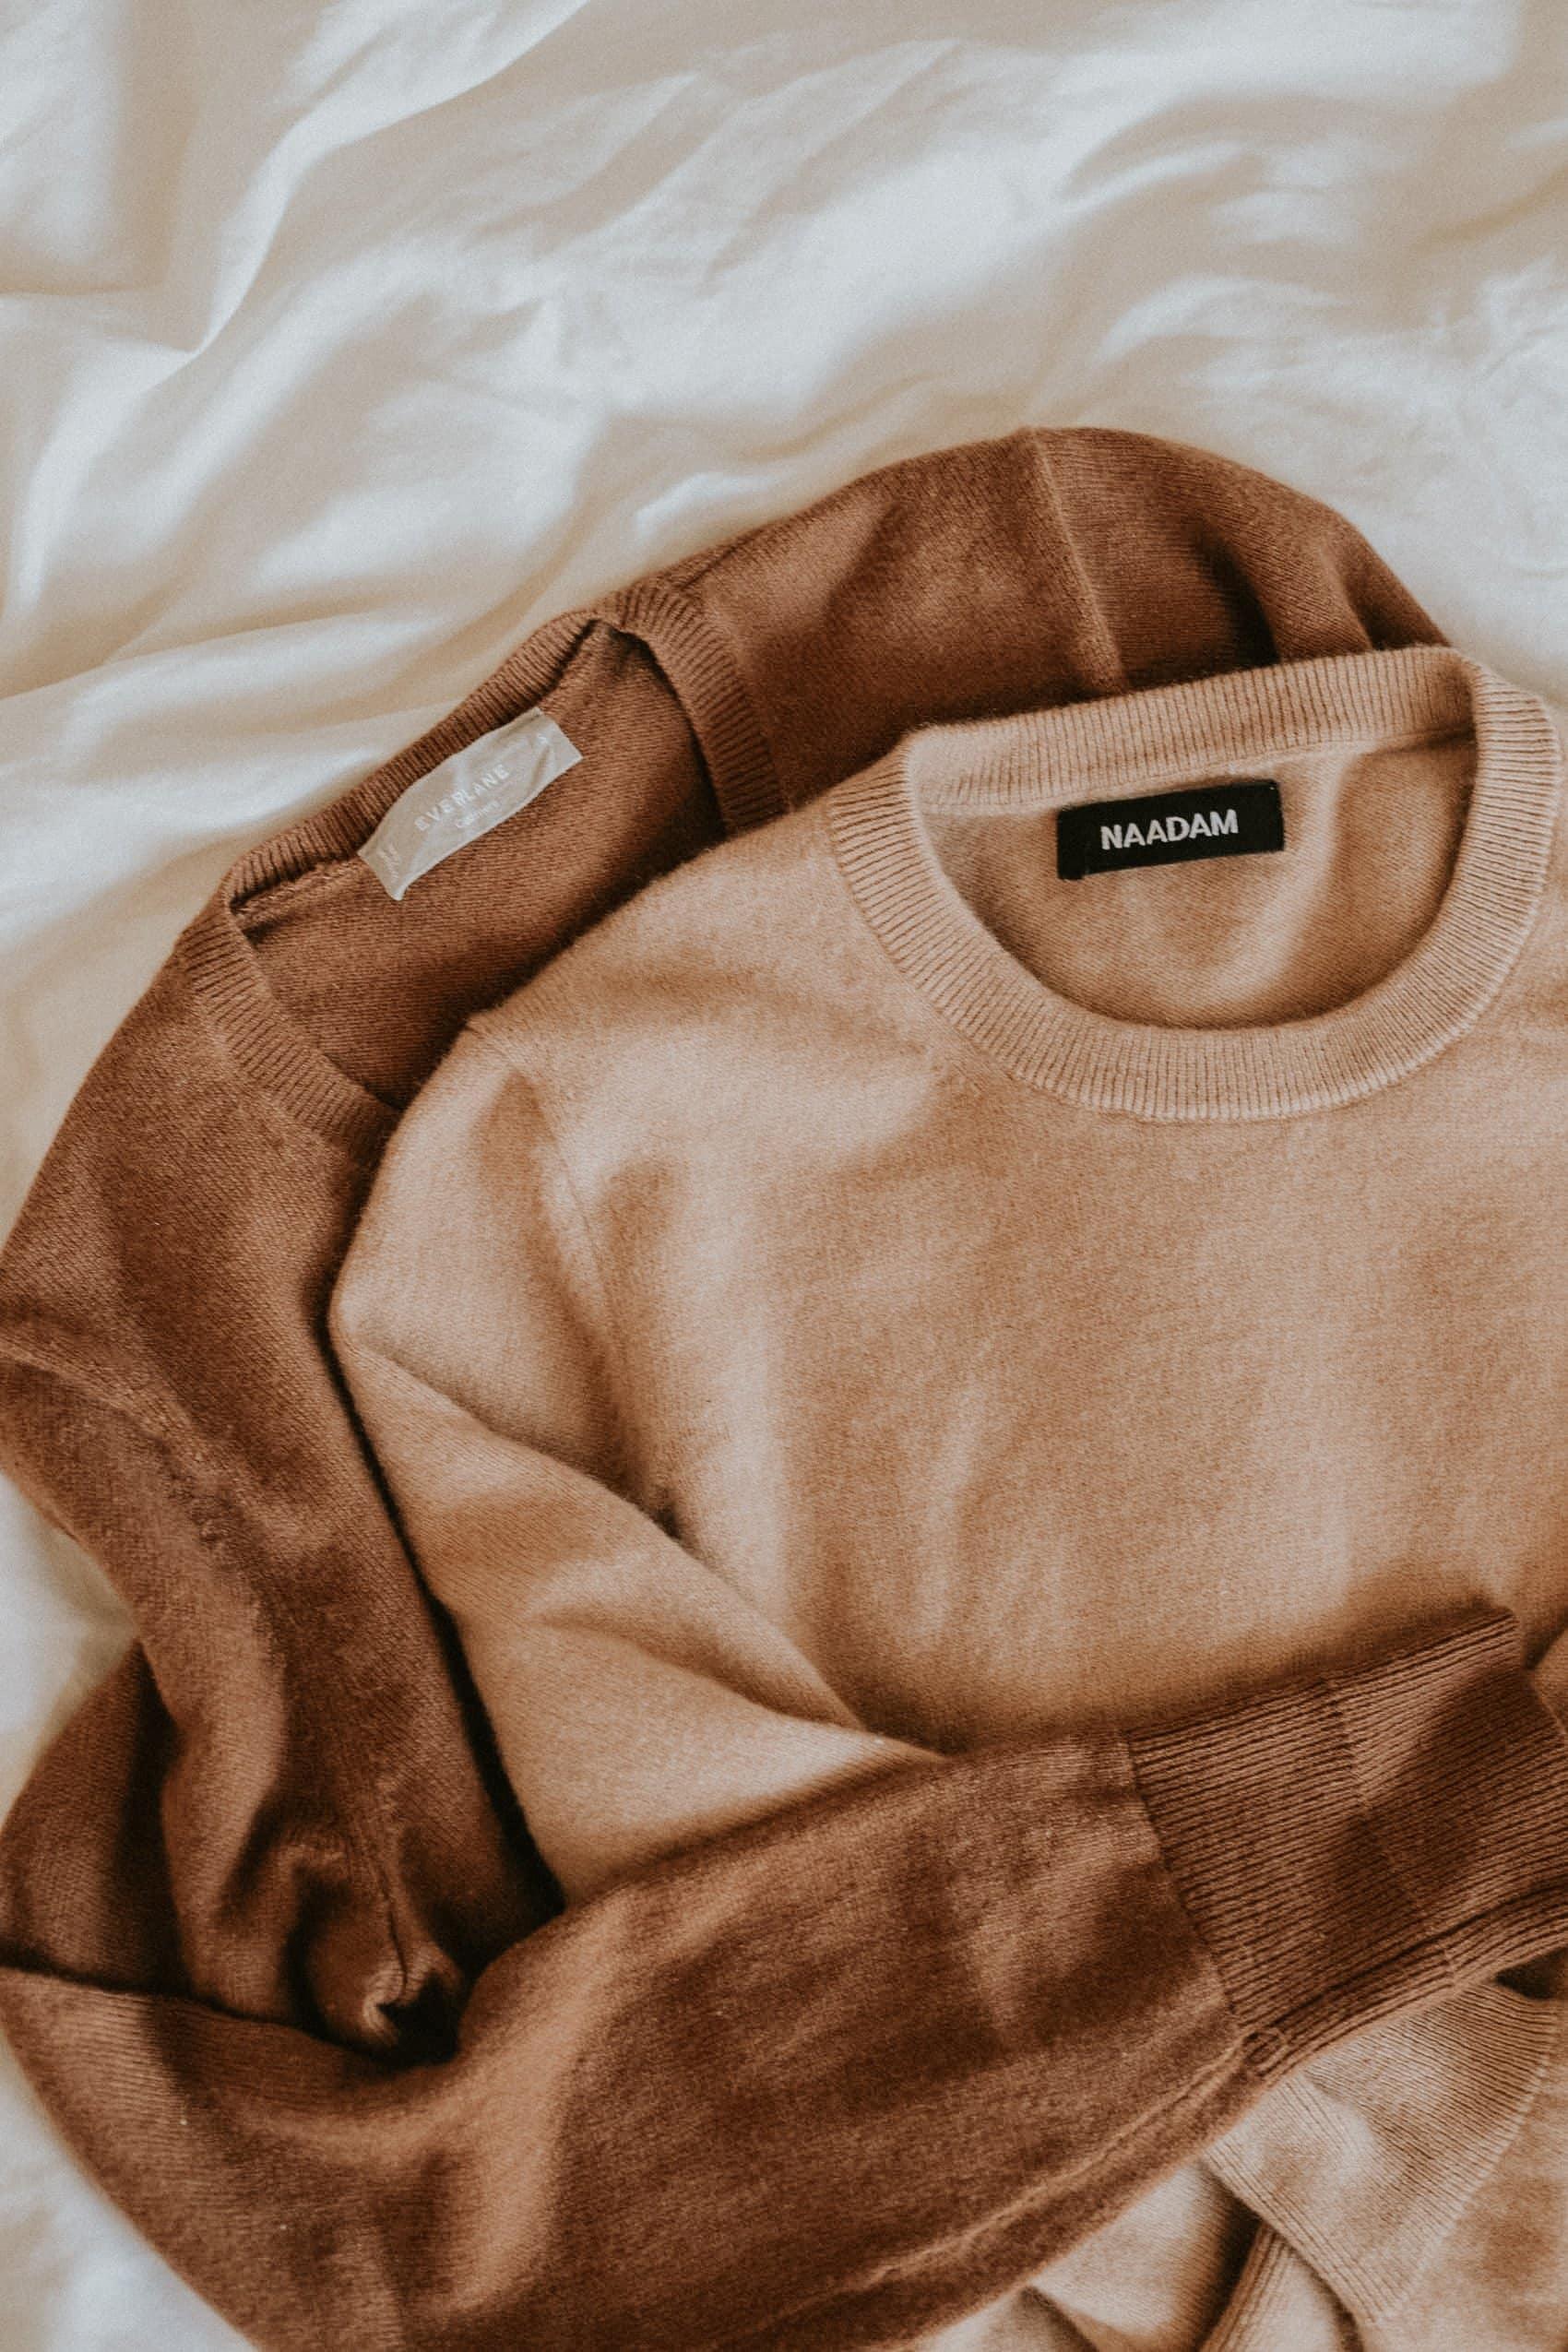 Everlane Cashmere Sweater vs. NAADAM Cashmere Sweater Review